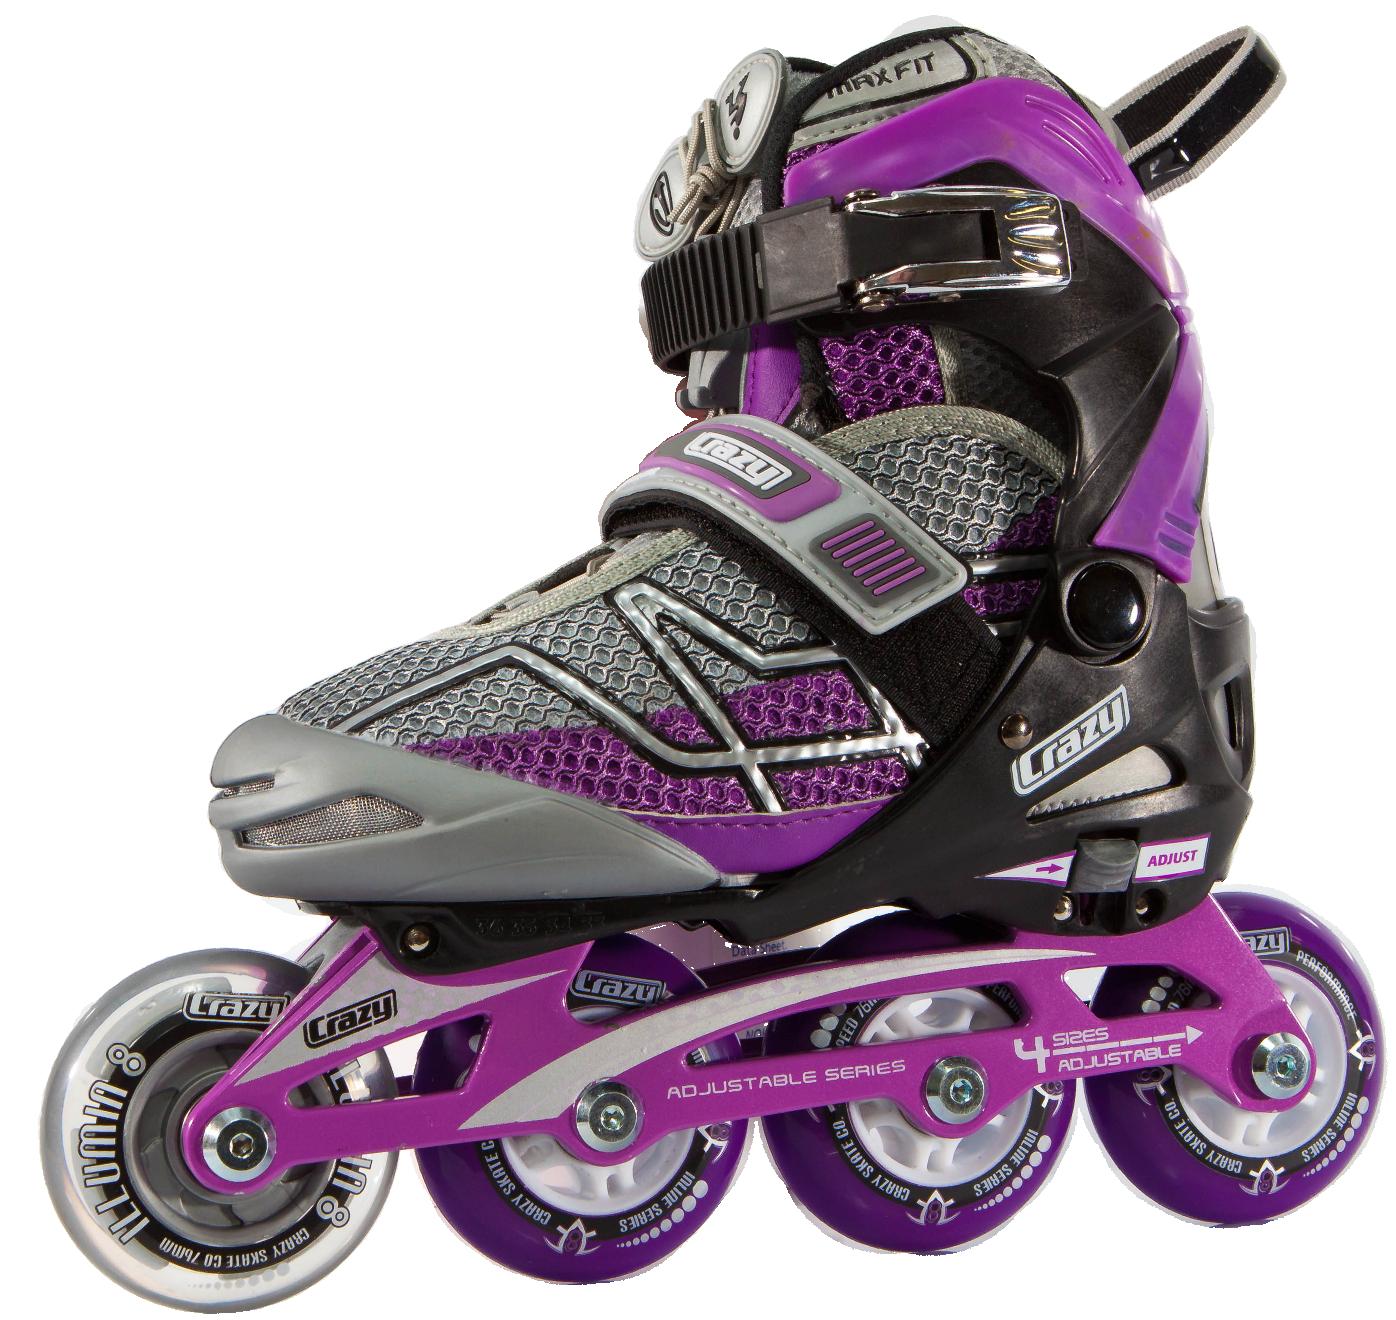 Crazy Skates 528 Adjustable Purple and Black Recreational Inline Skates - Rollerblades PNG